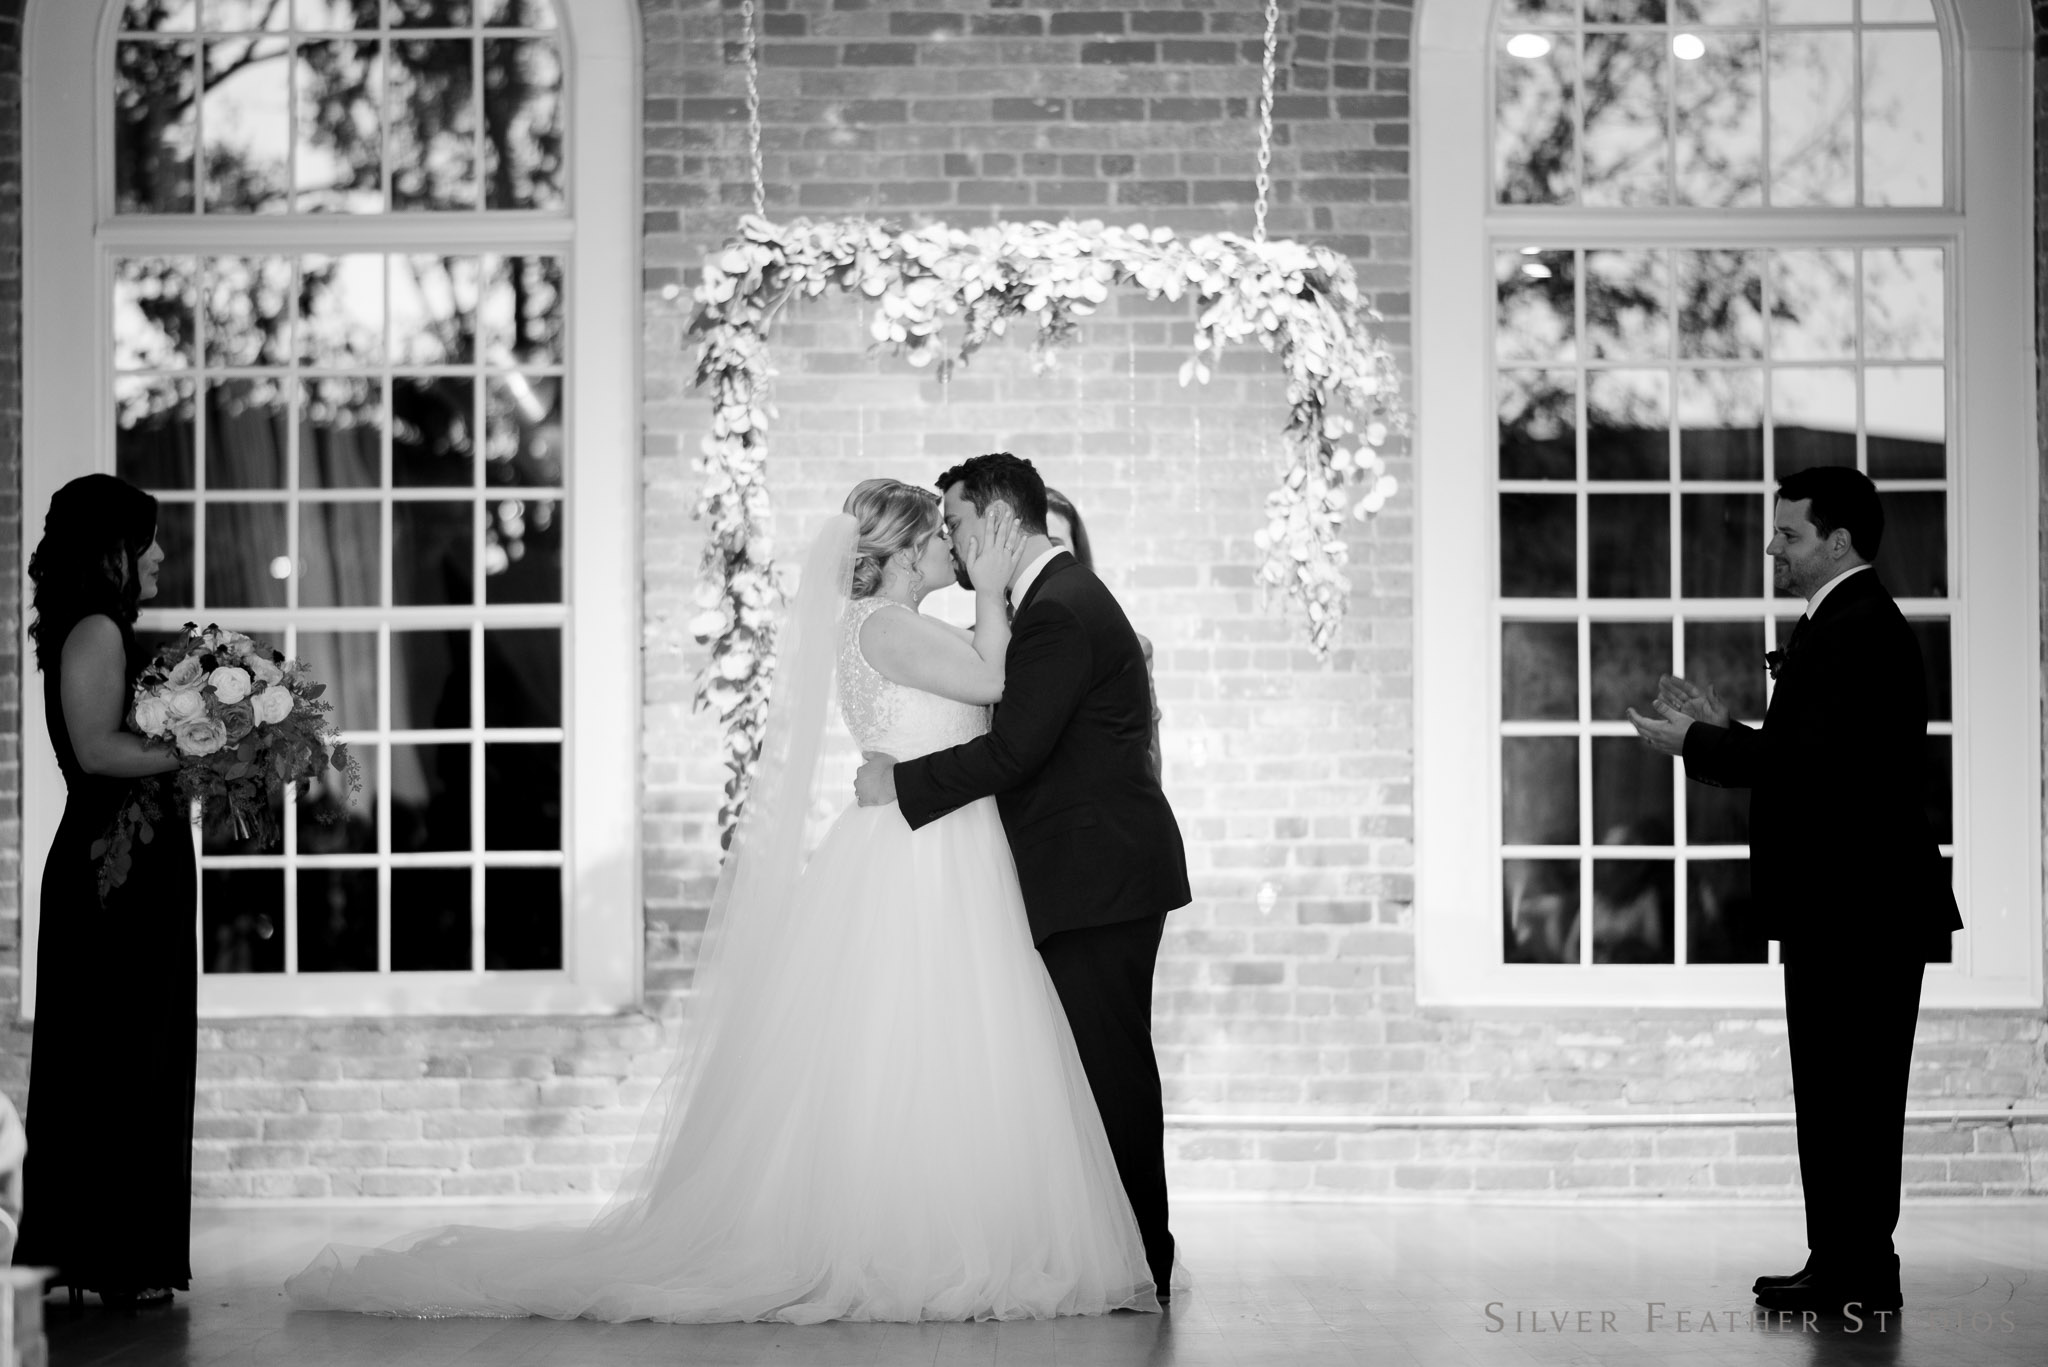 cottom-room-wedding-photography-034.jpg